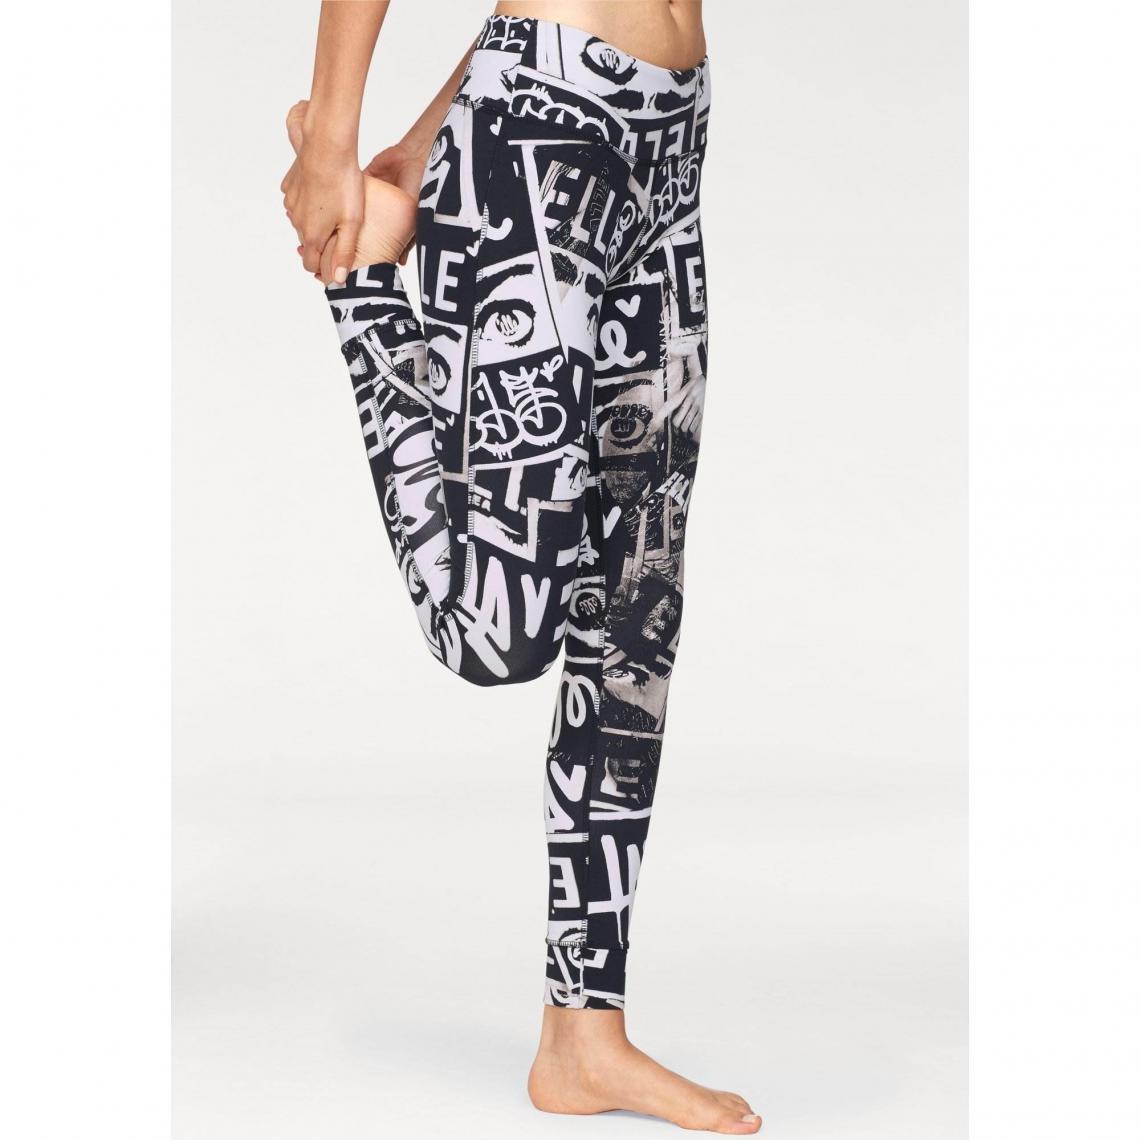 Legging femme Speedwick® REEBOK X ELLE LUX TIGHT Reebok Noir Blanc Plus de détails